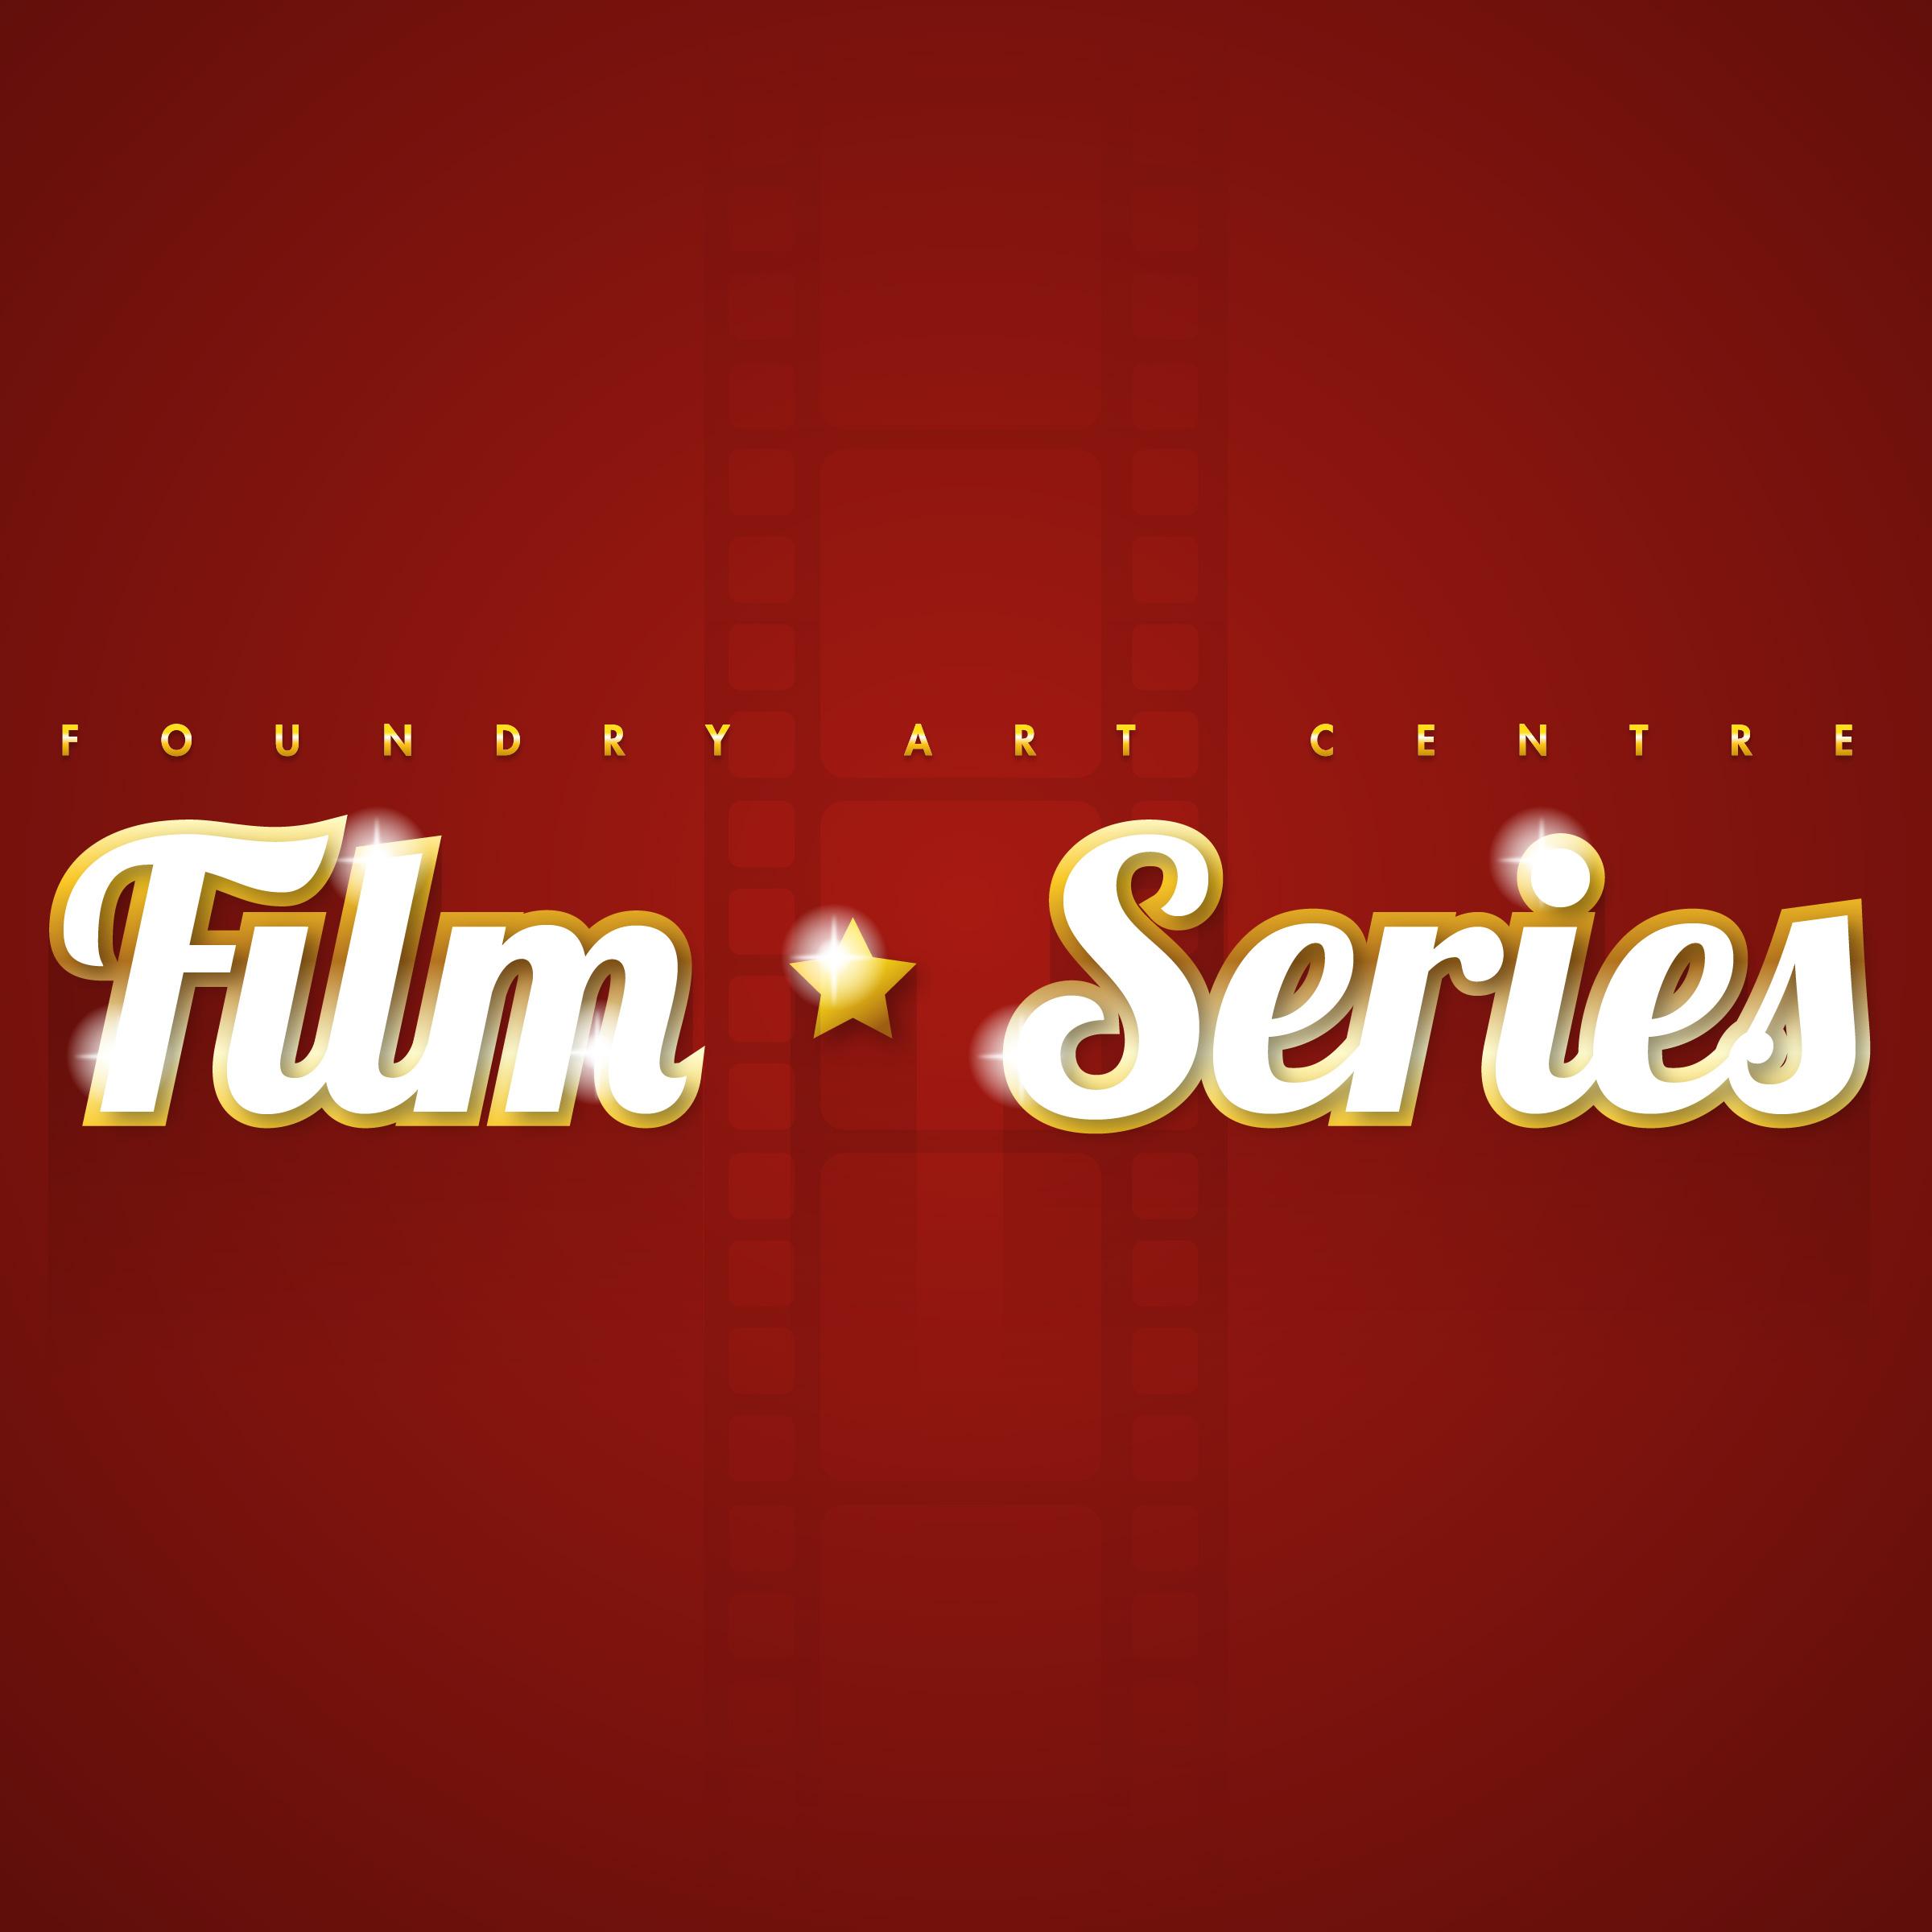 Fim_Series-06.jpg